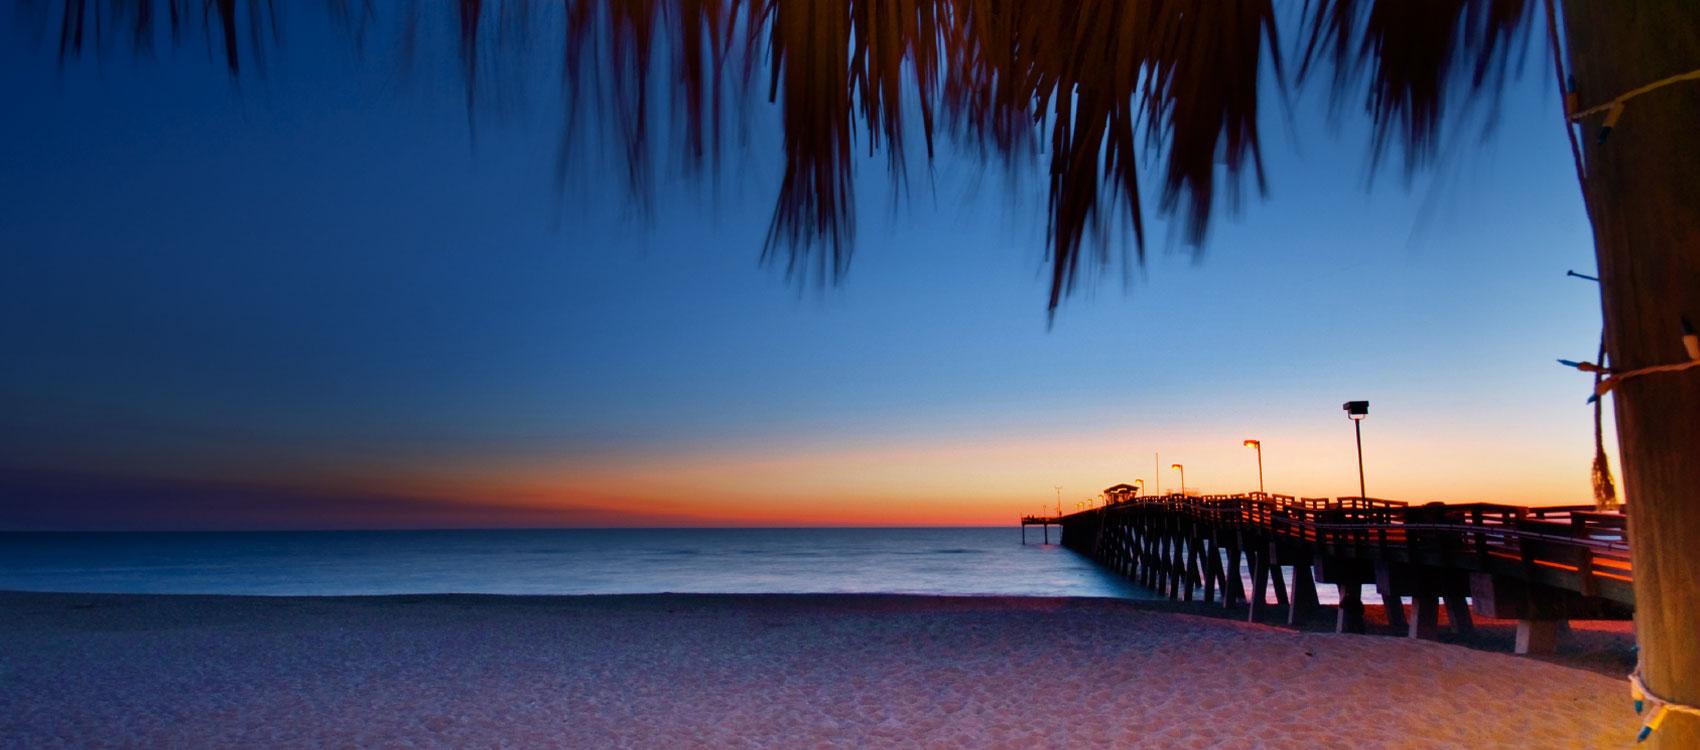 Seafood Vero Beach Florida